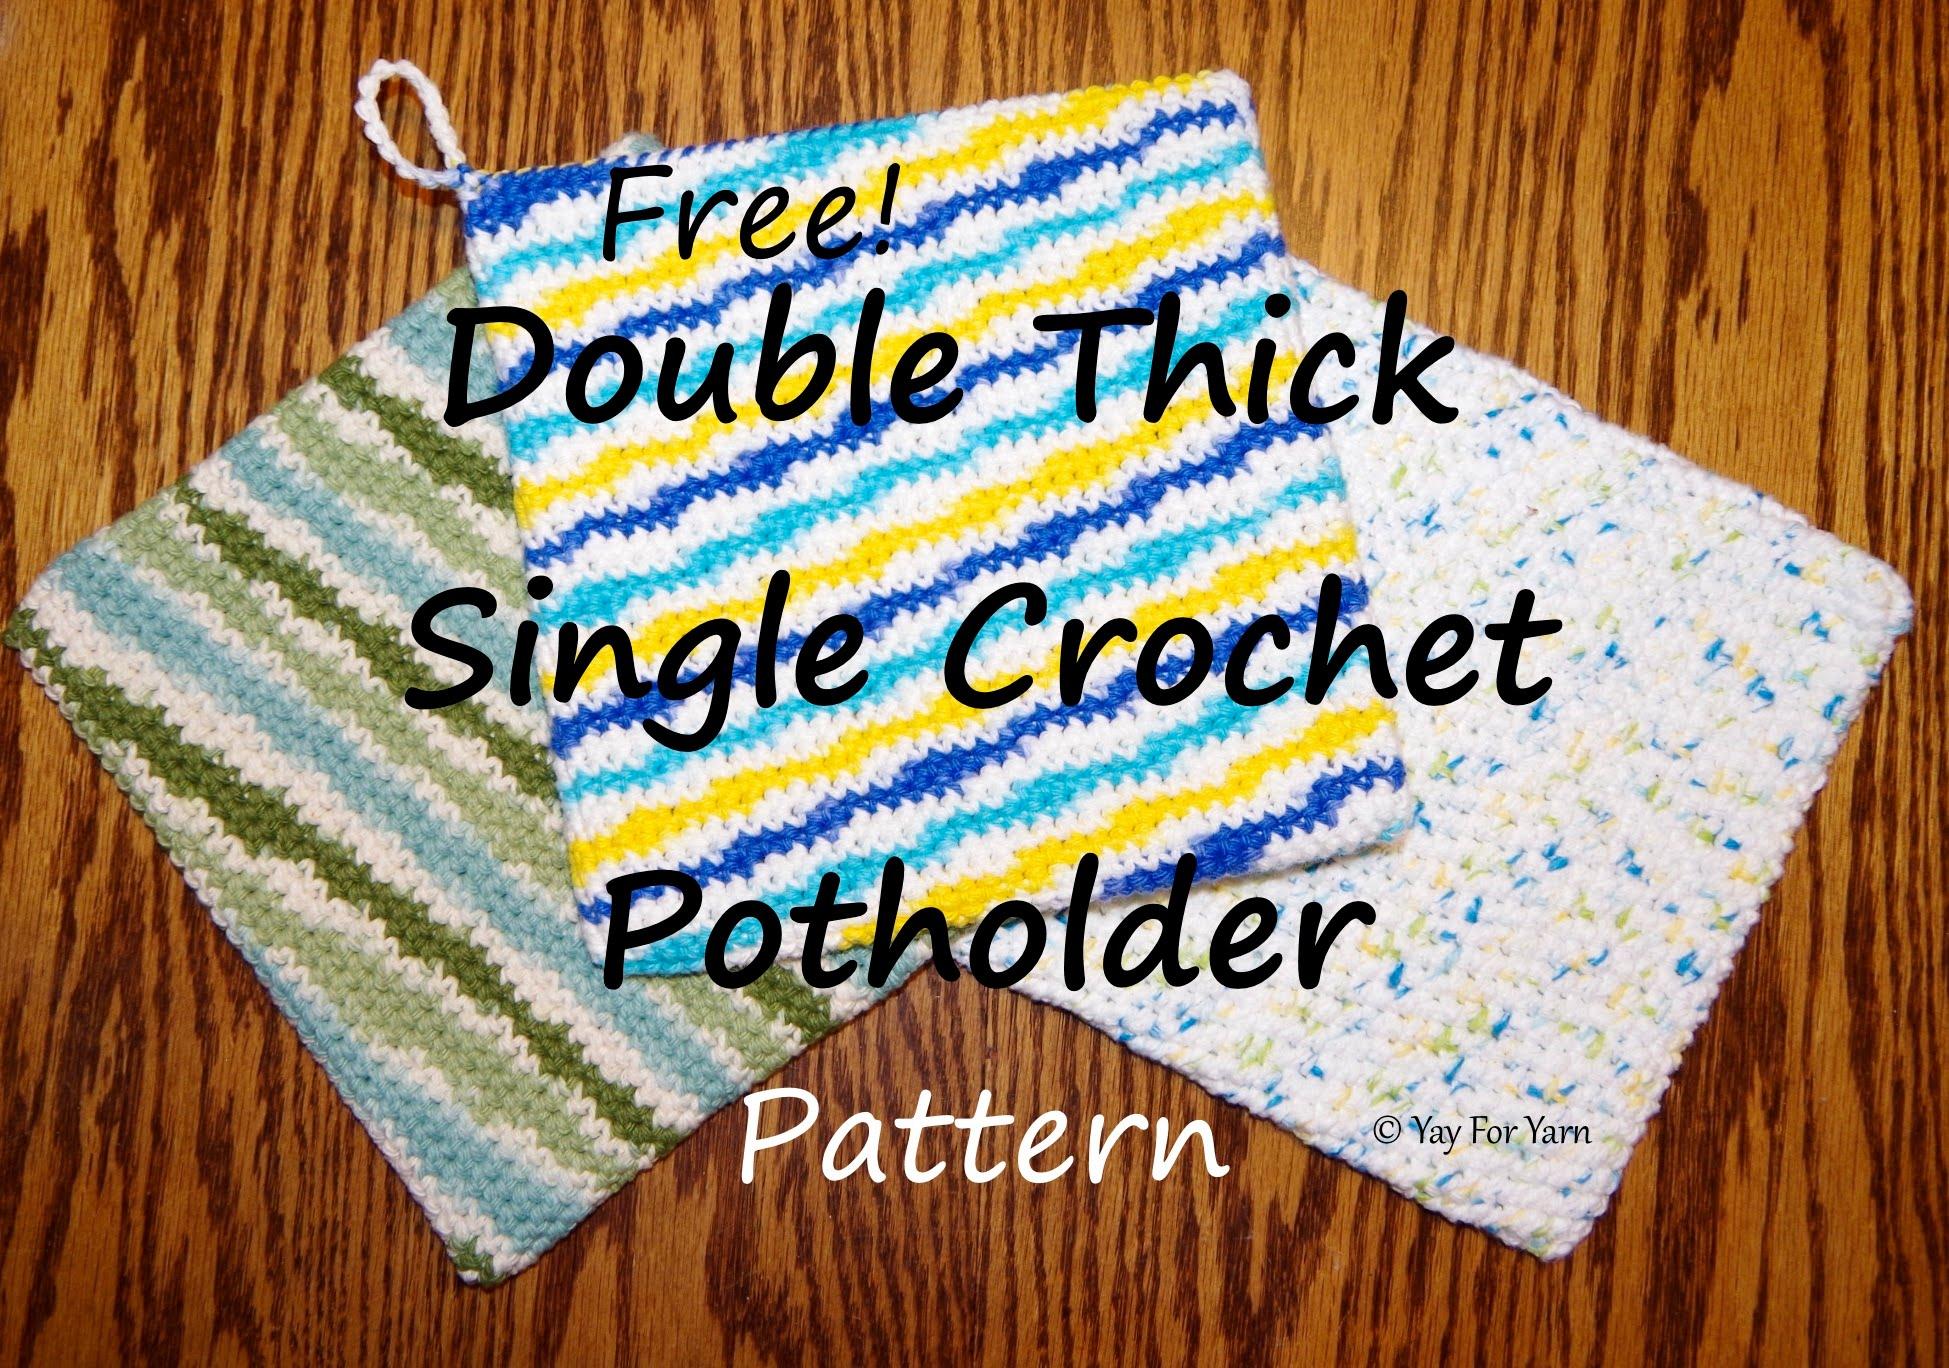 Crochet Trivets Hot Pads Double Thick Single Crochet Potholder Free Crochet Pattern Yay